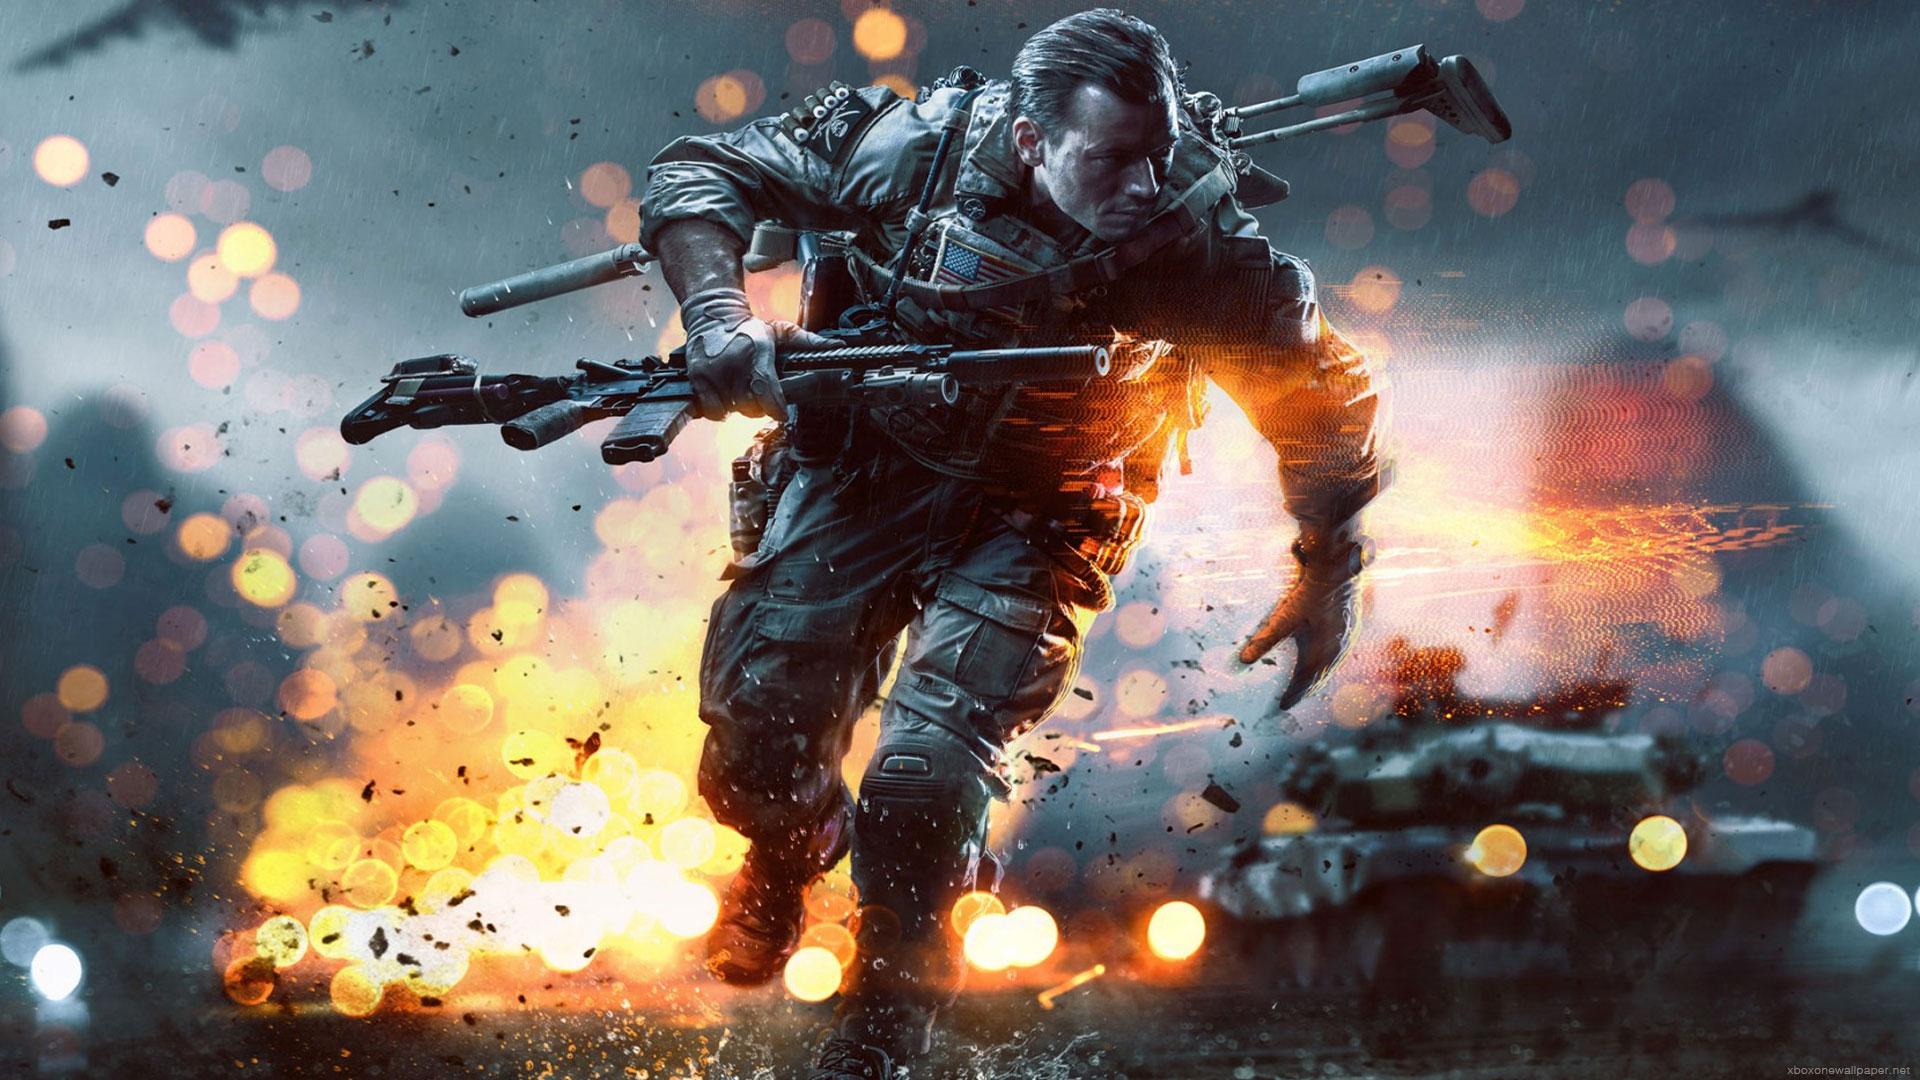 Battlefield 4 Wallpaper Xbox One Wallpaper Game HD Wallpaper 1080p 1920x1080